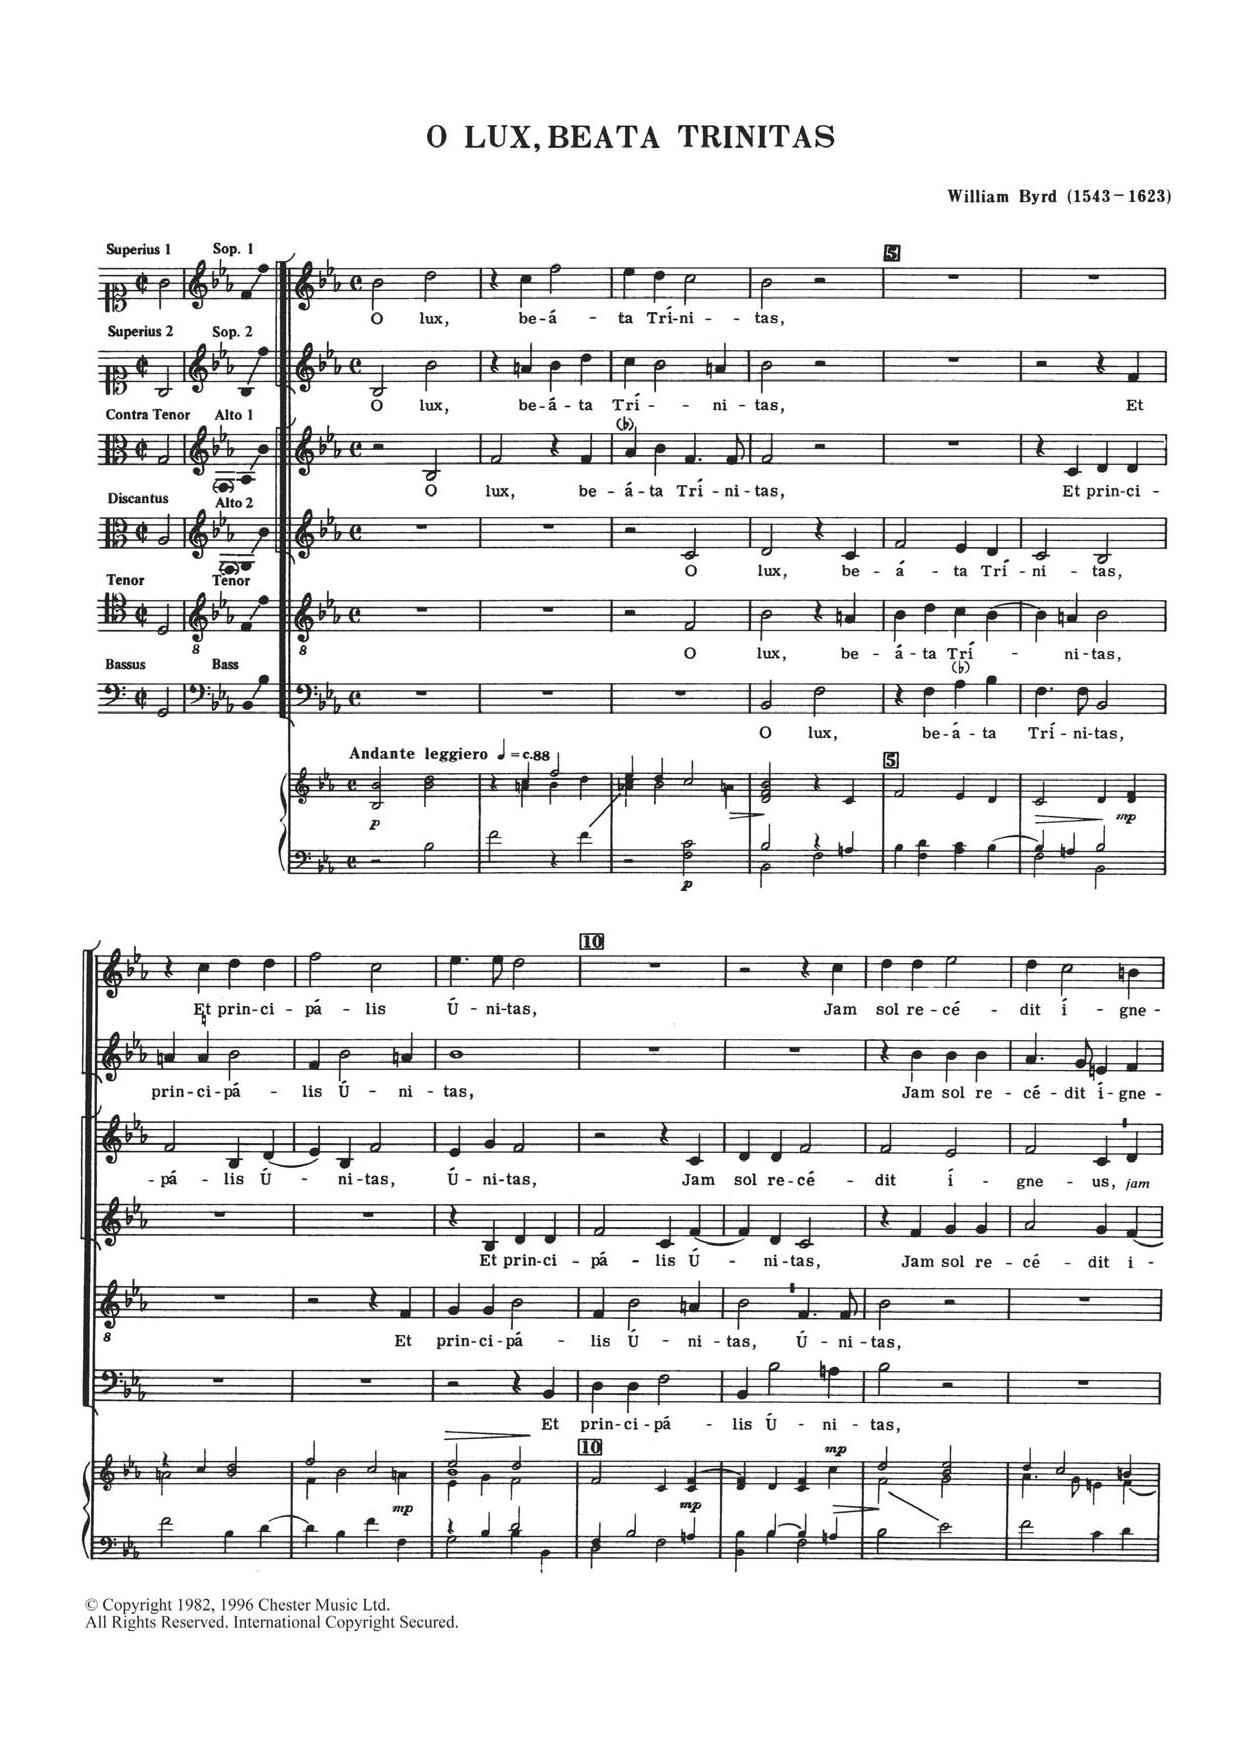 O Lux, Beata Trinitas Sheet Music